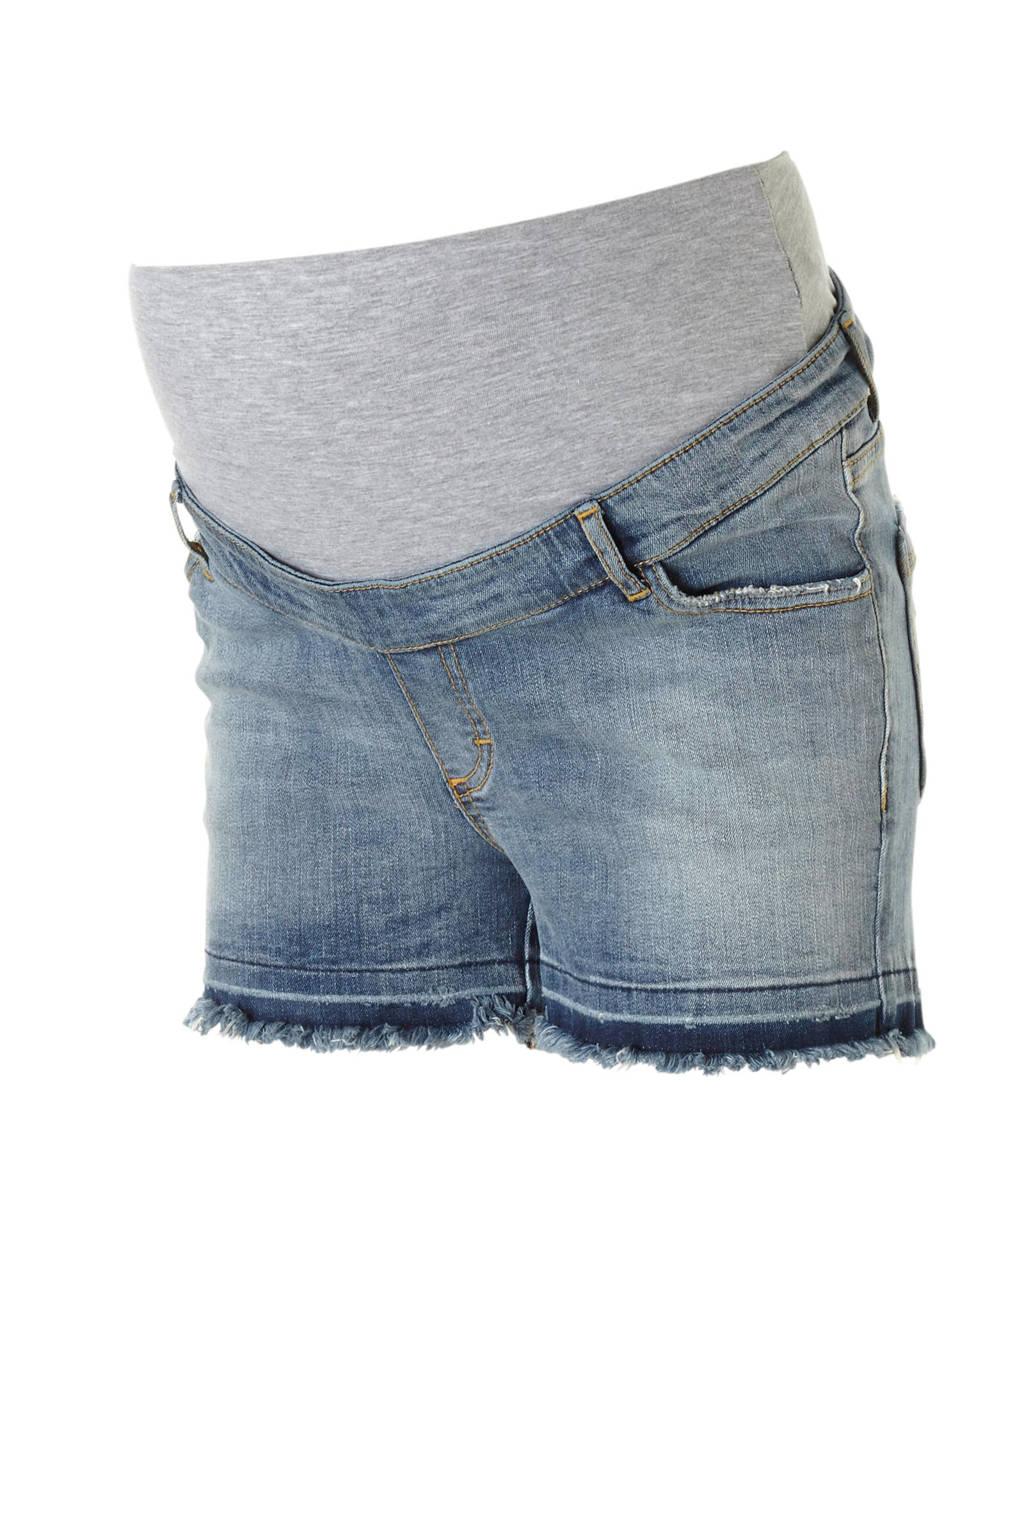 GeBe Maternity zwangerschaps jeans short Paloma, Denim blauw